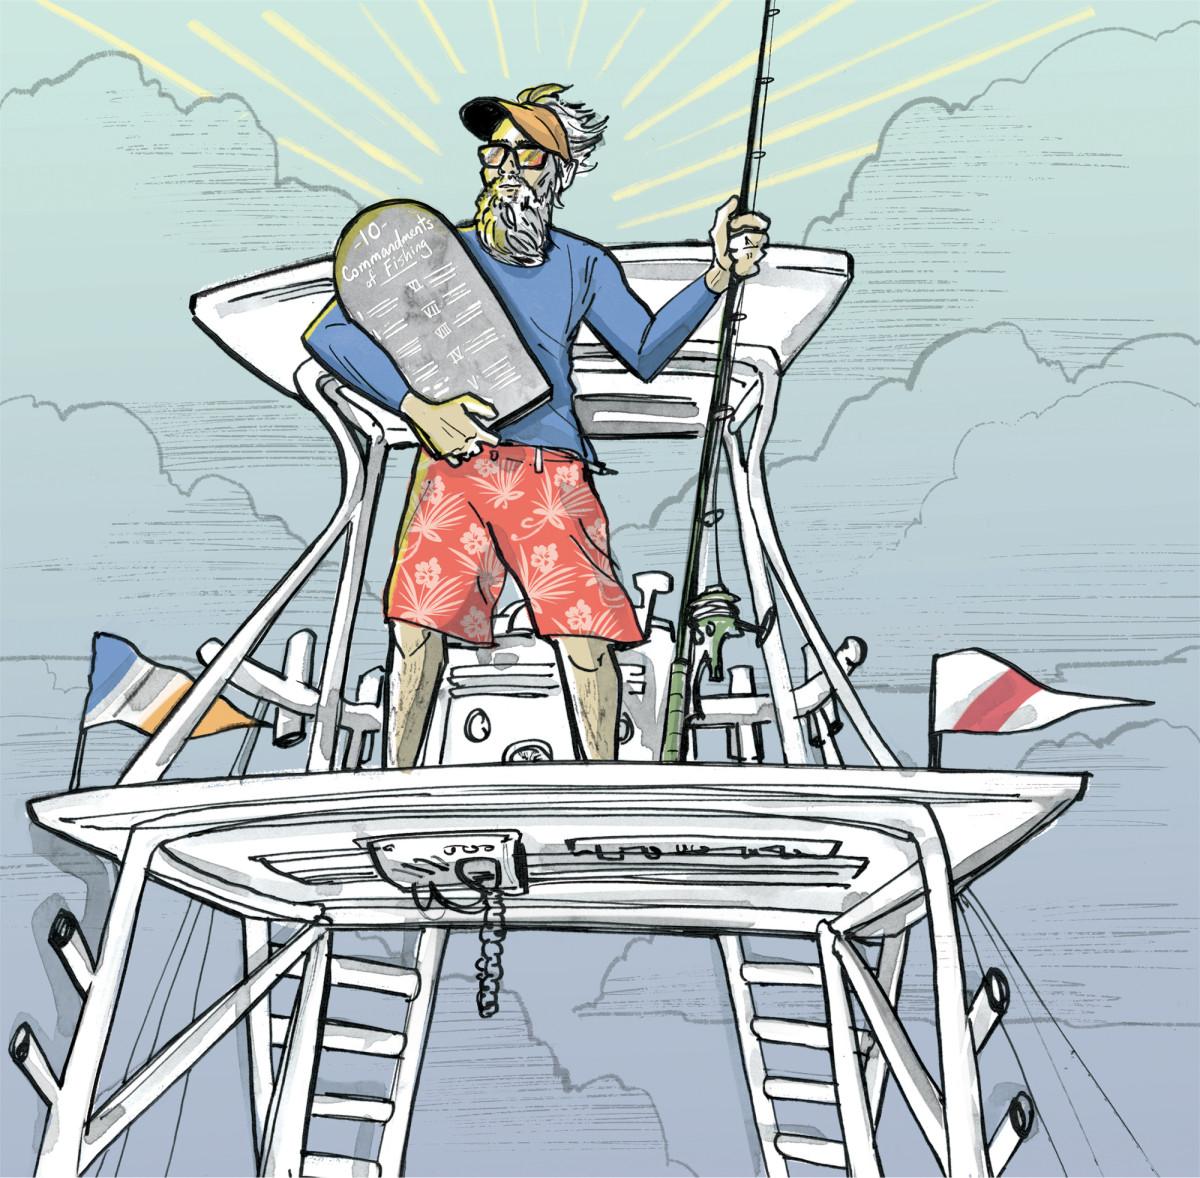 The Ten Commandments of Fishing